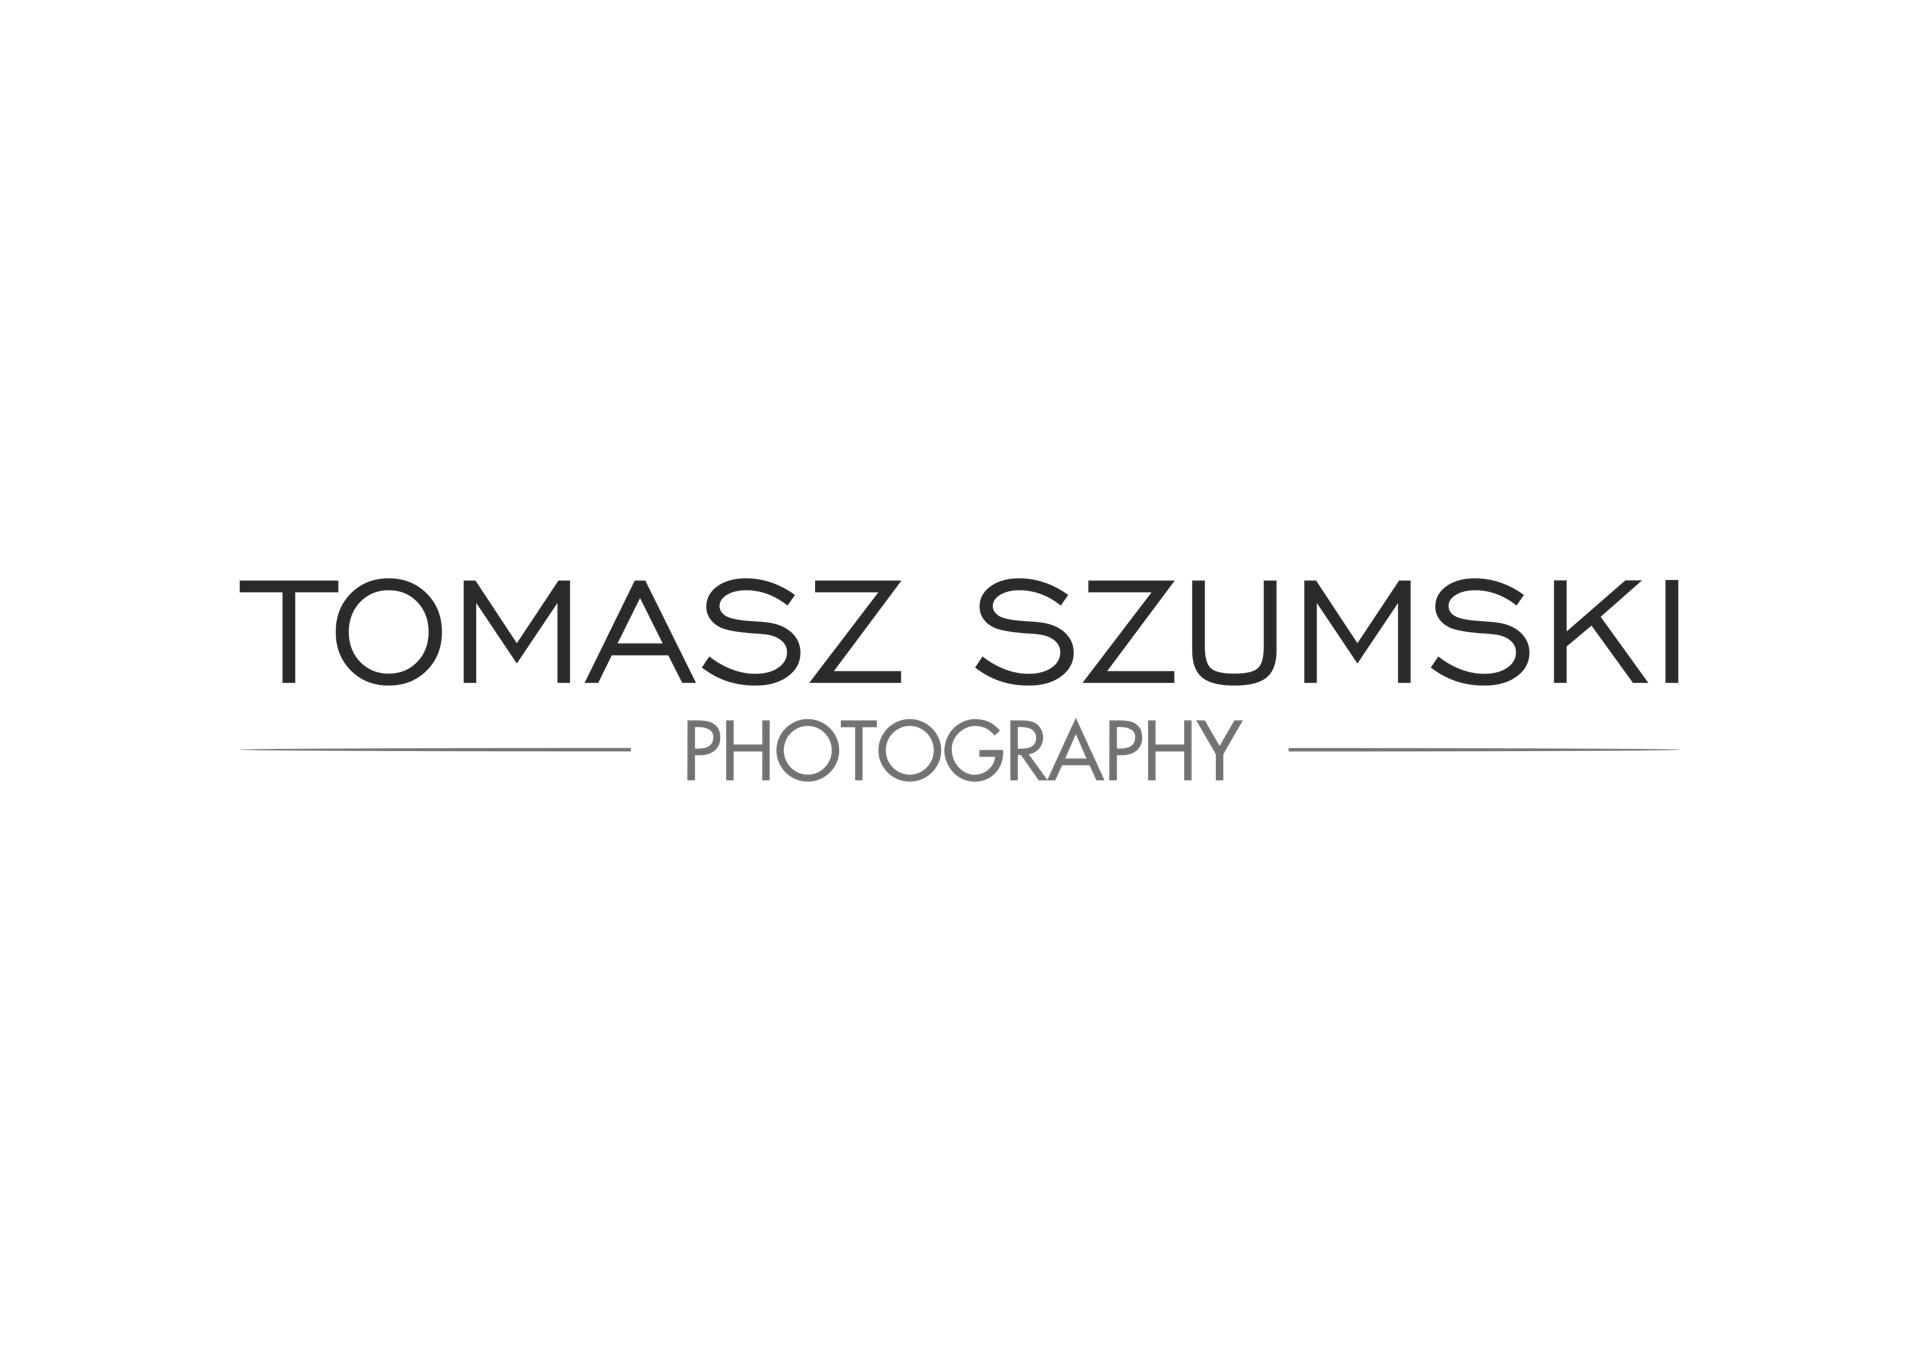 Tomasz Szumski Photography